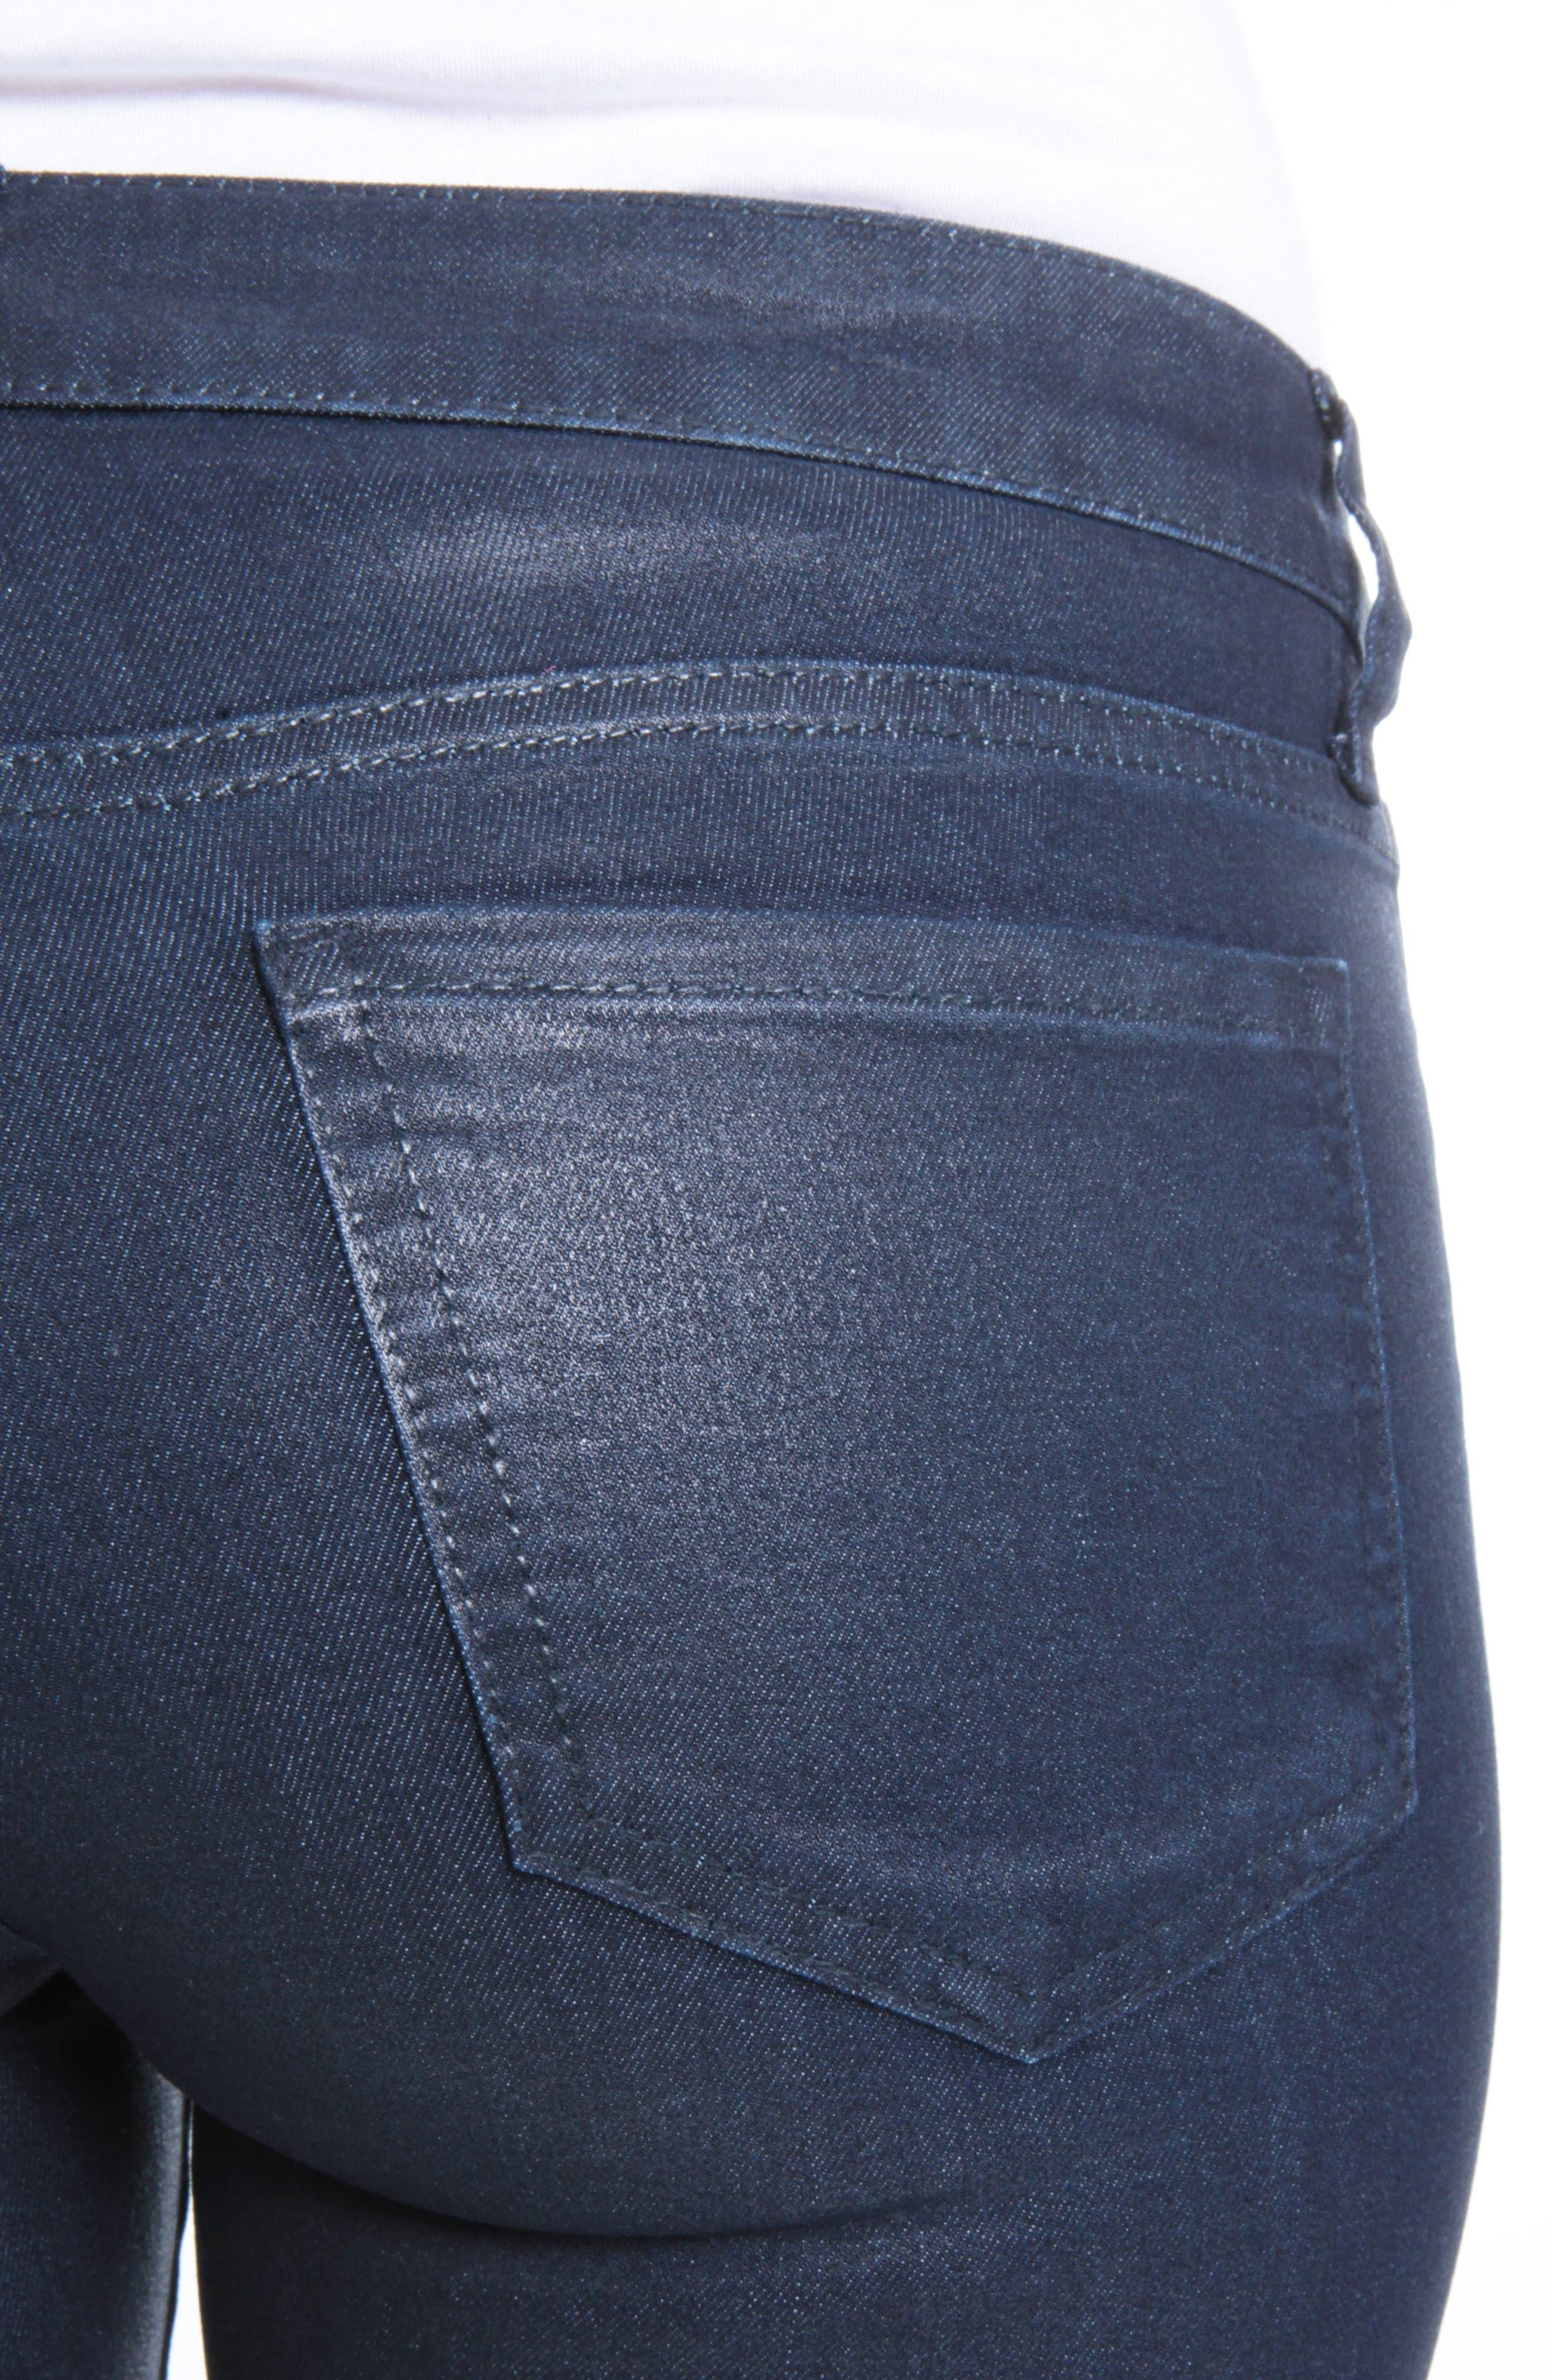 Mia Navy Coated Jeans,                             Alternate thumbnail 4, color,                             416